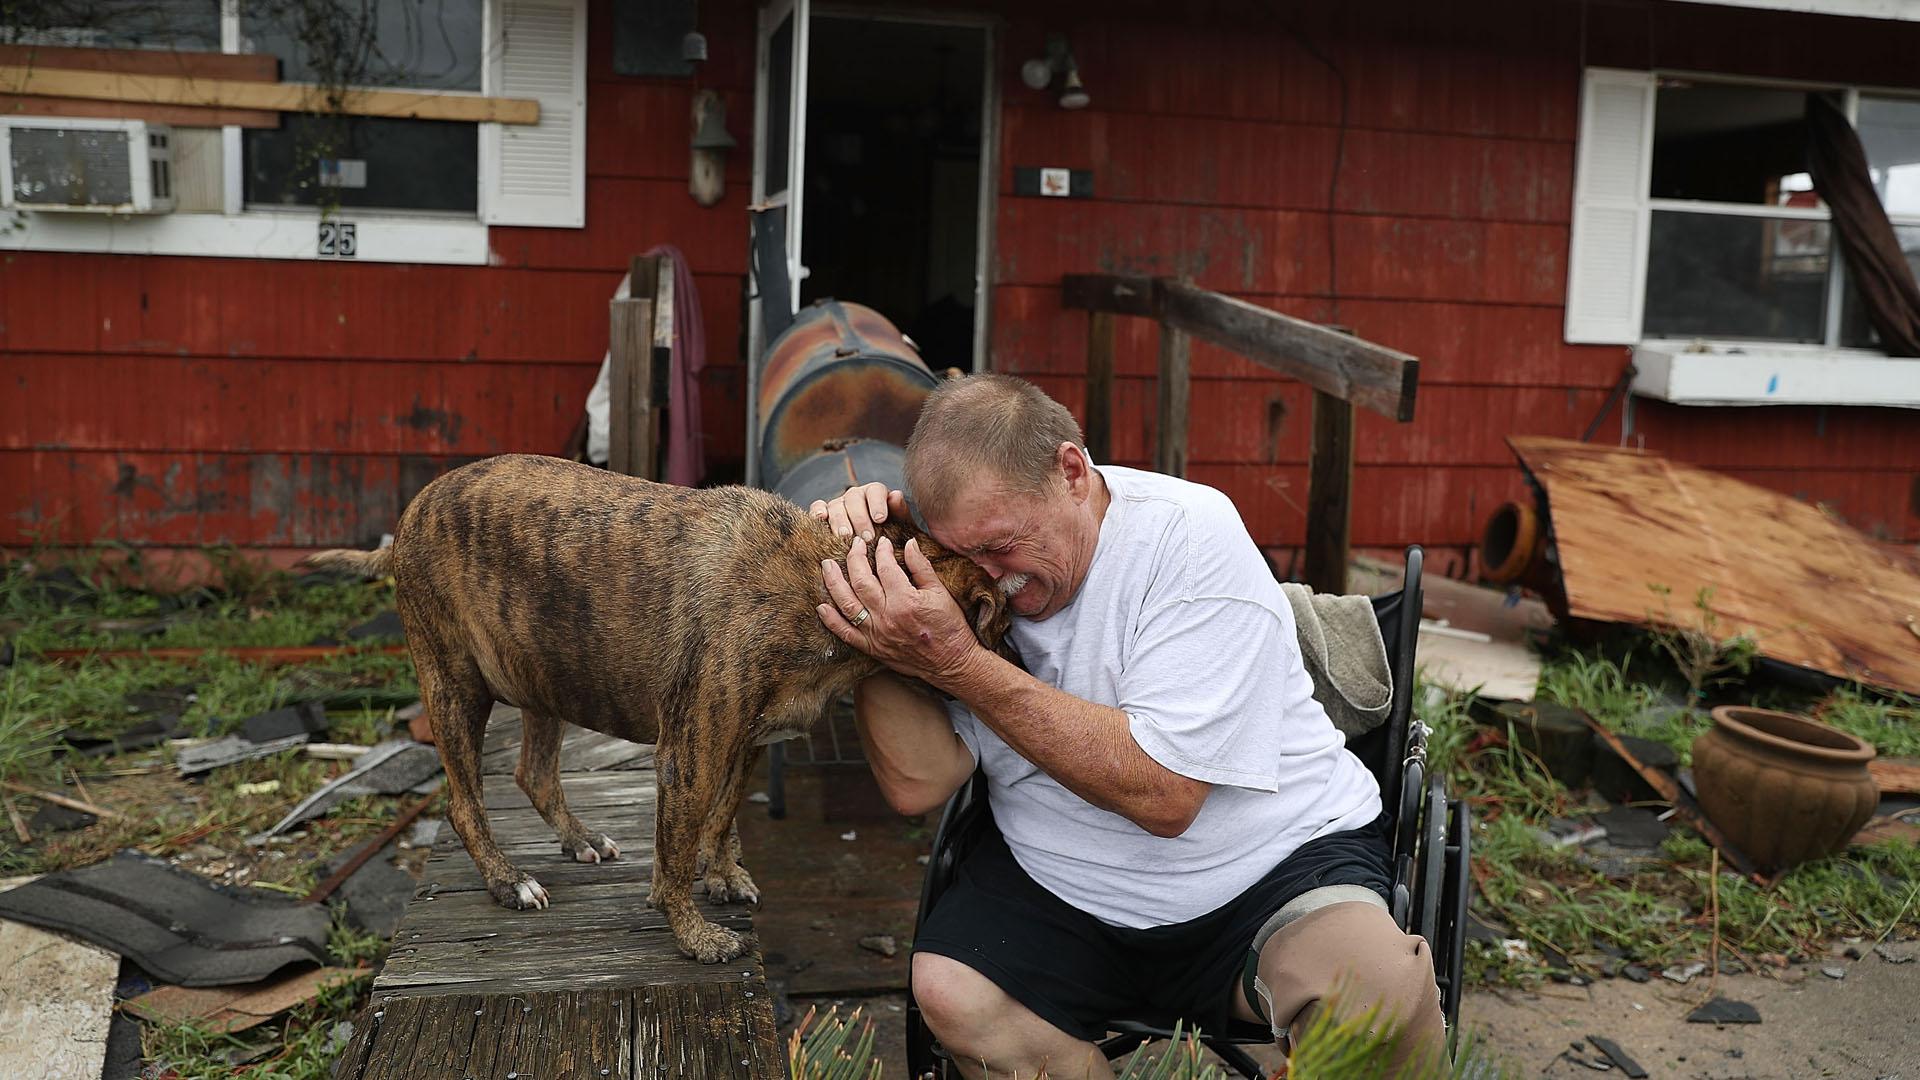 Dog, man crying in Rockport, Hurricane Harvey31096473-159532